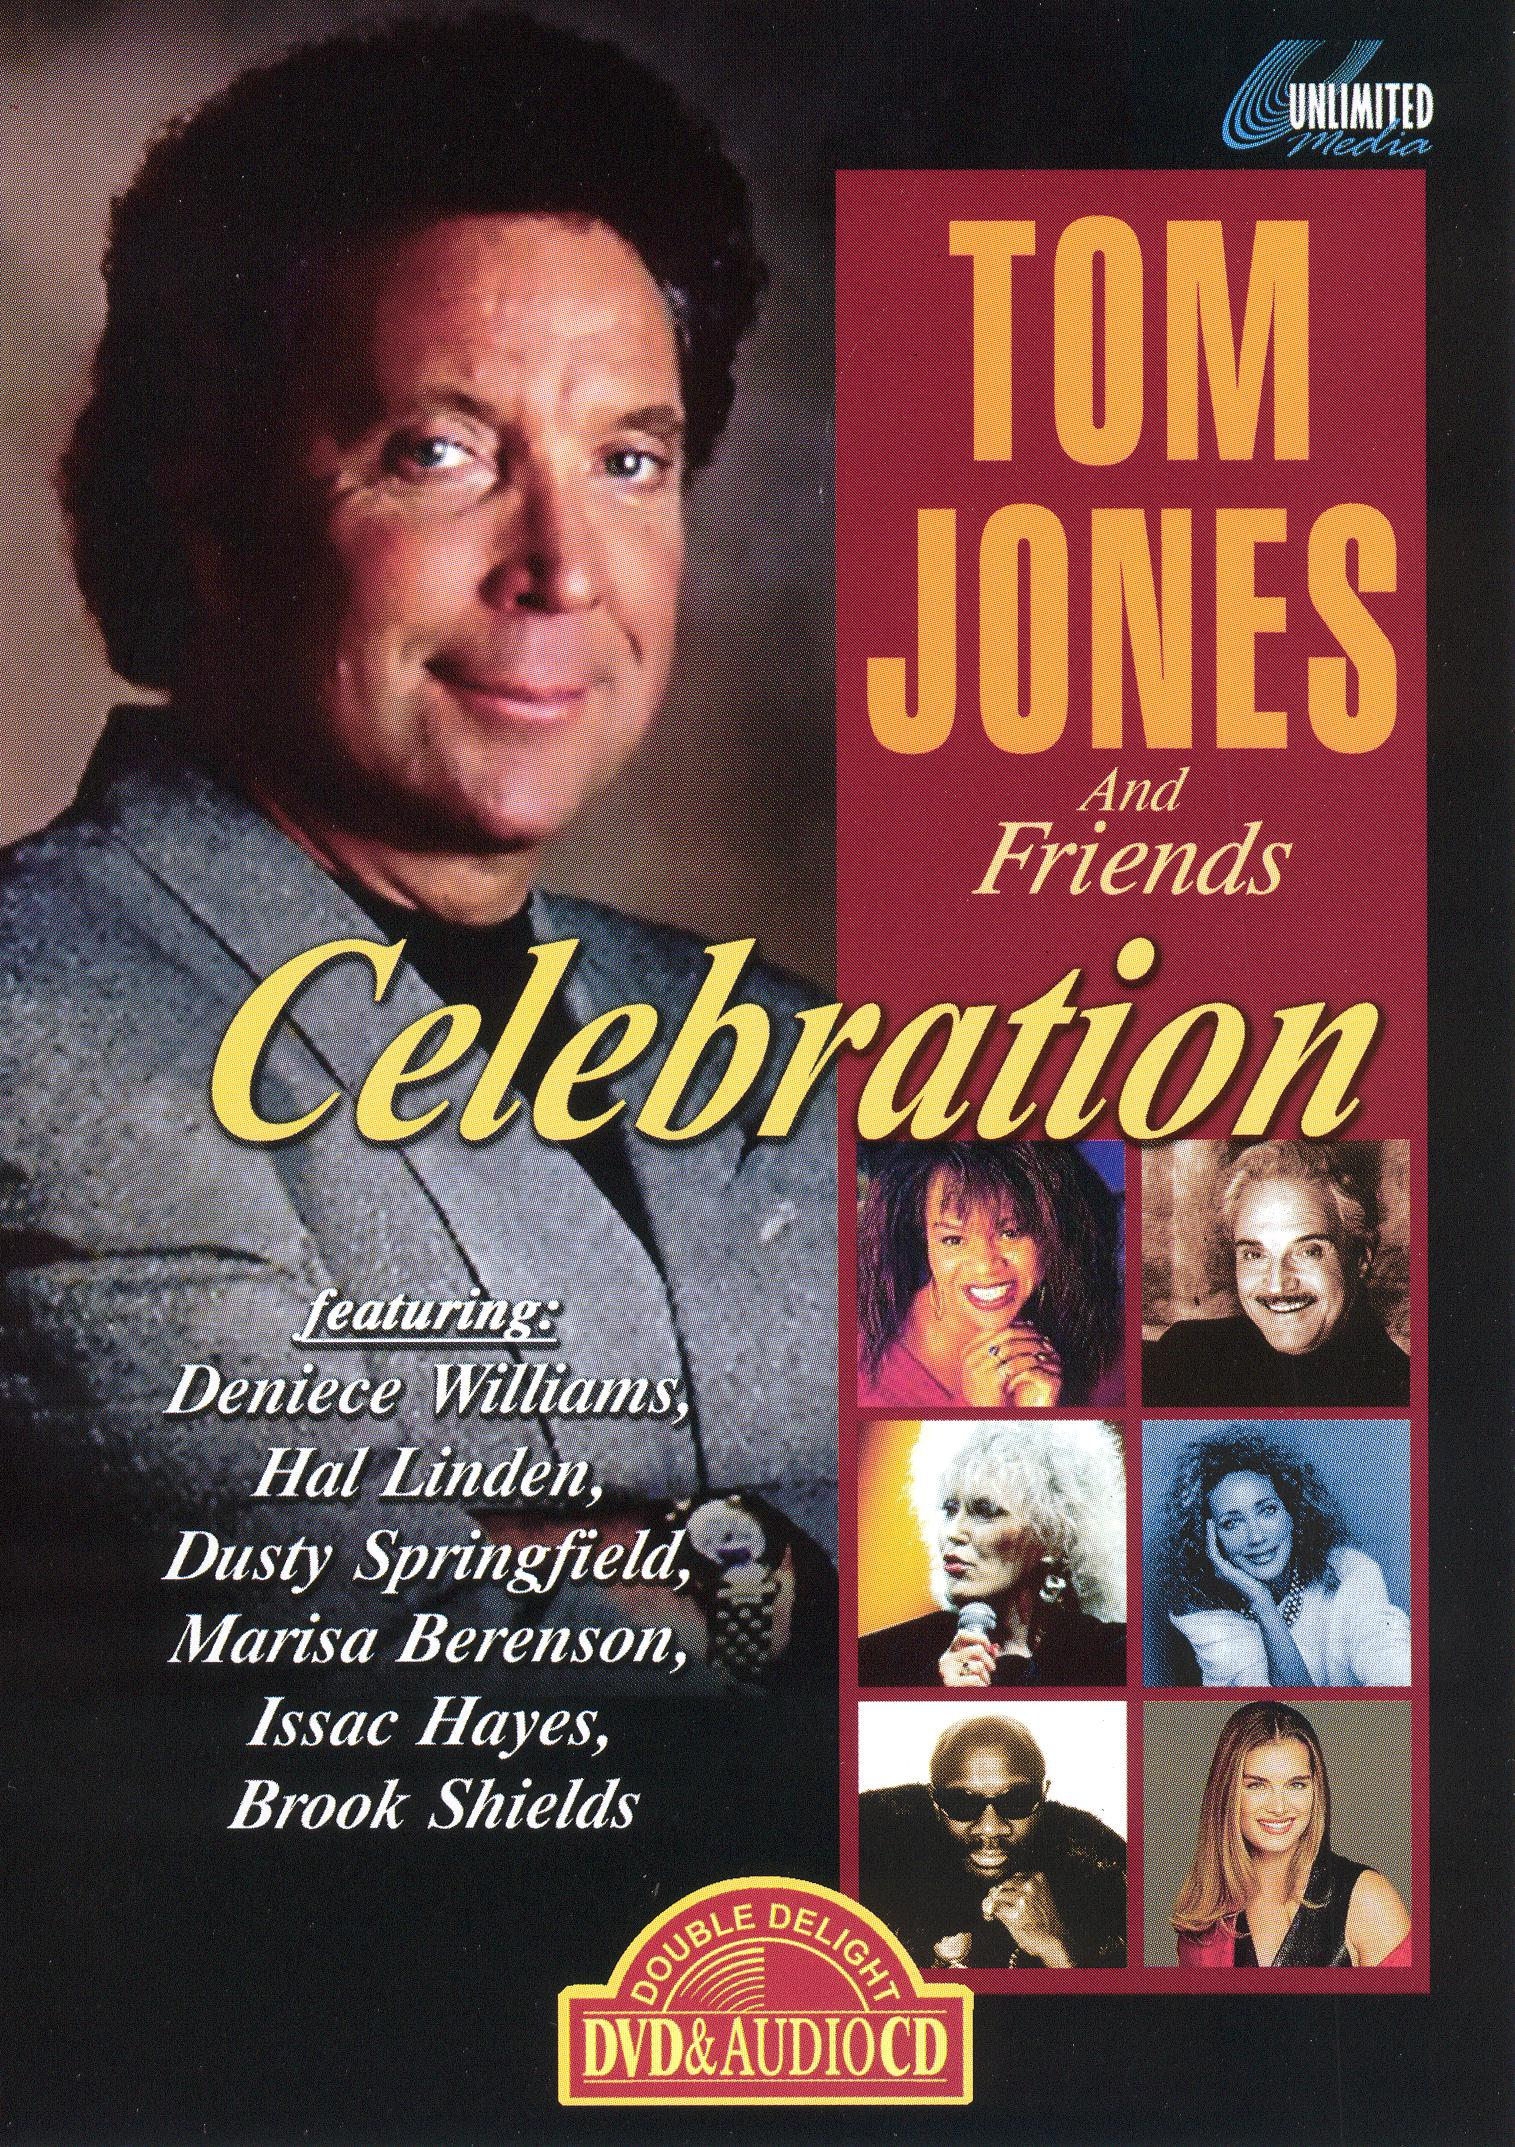 Tom Jones, Vol. 1: Celebration